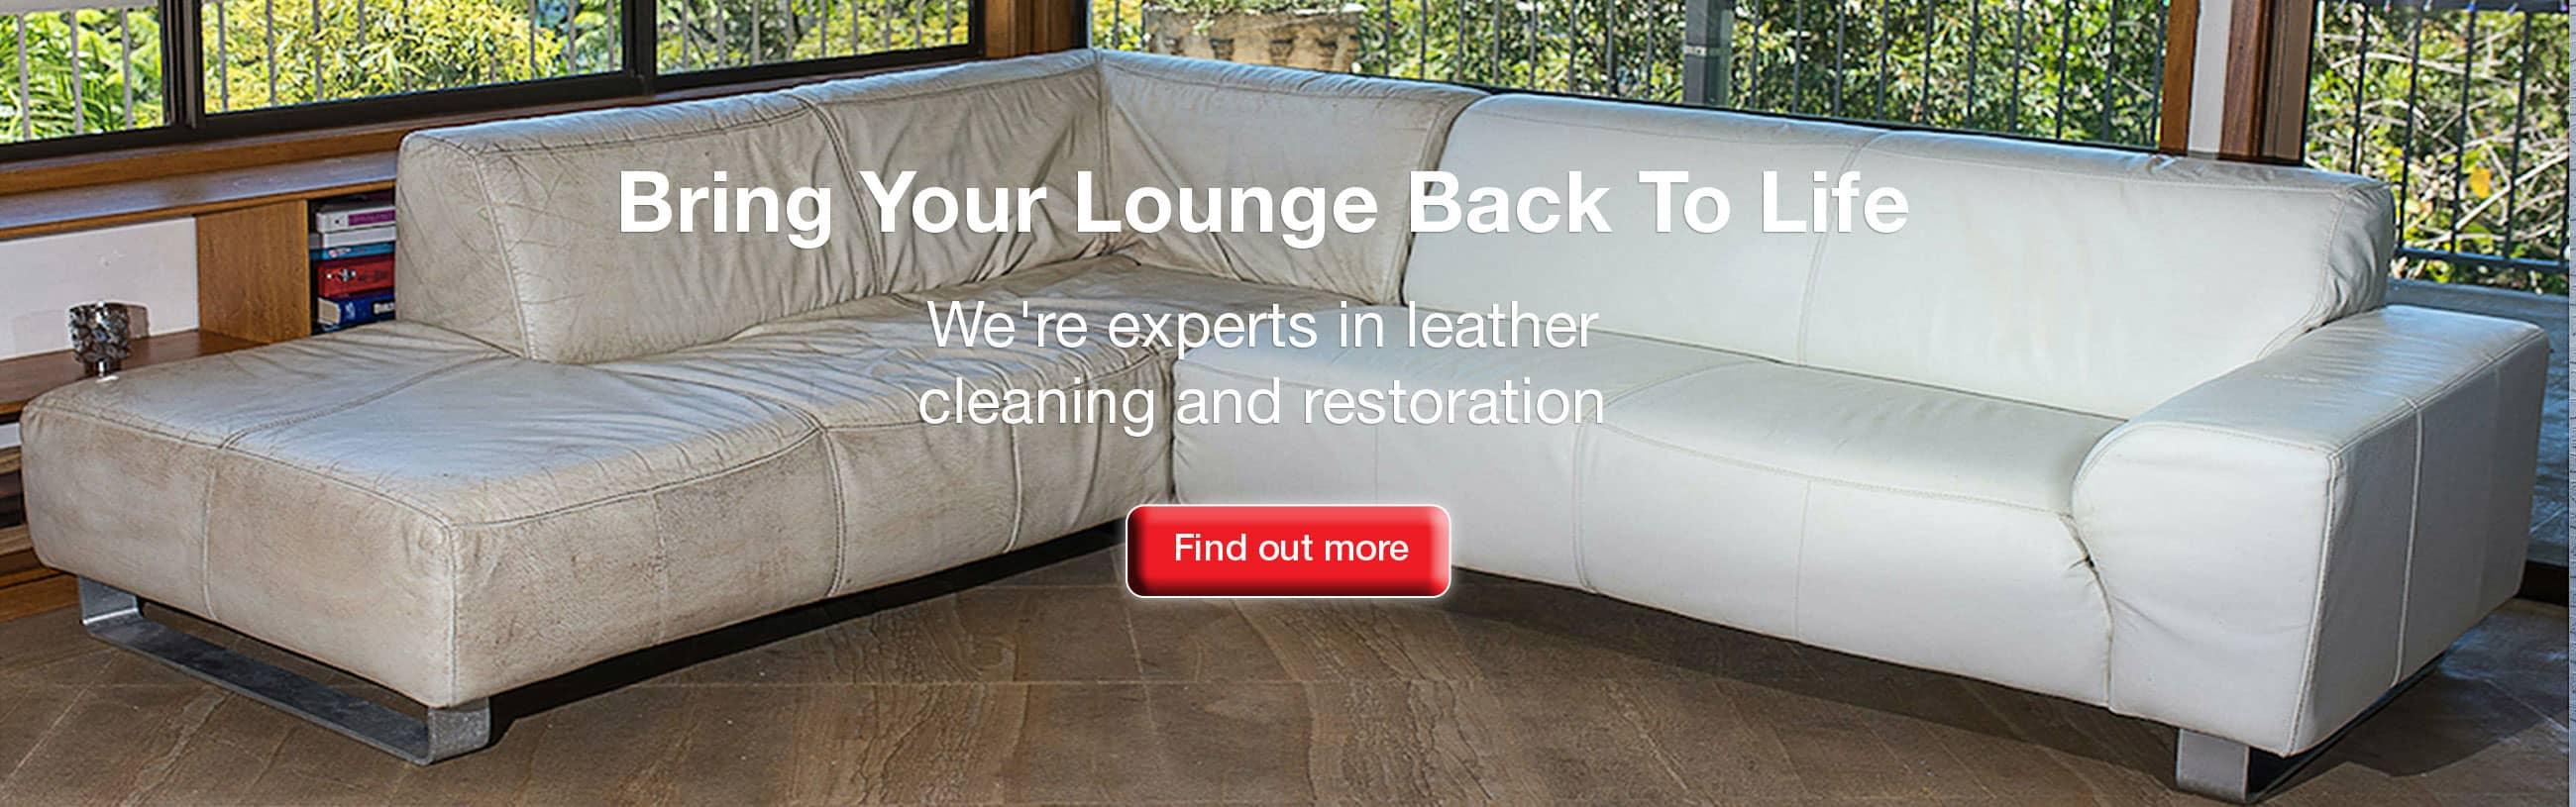 Leather Sofa Refurbishment